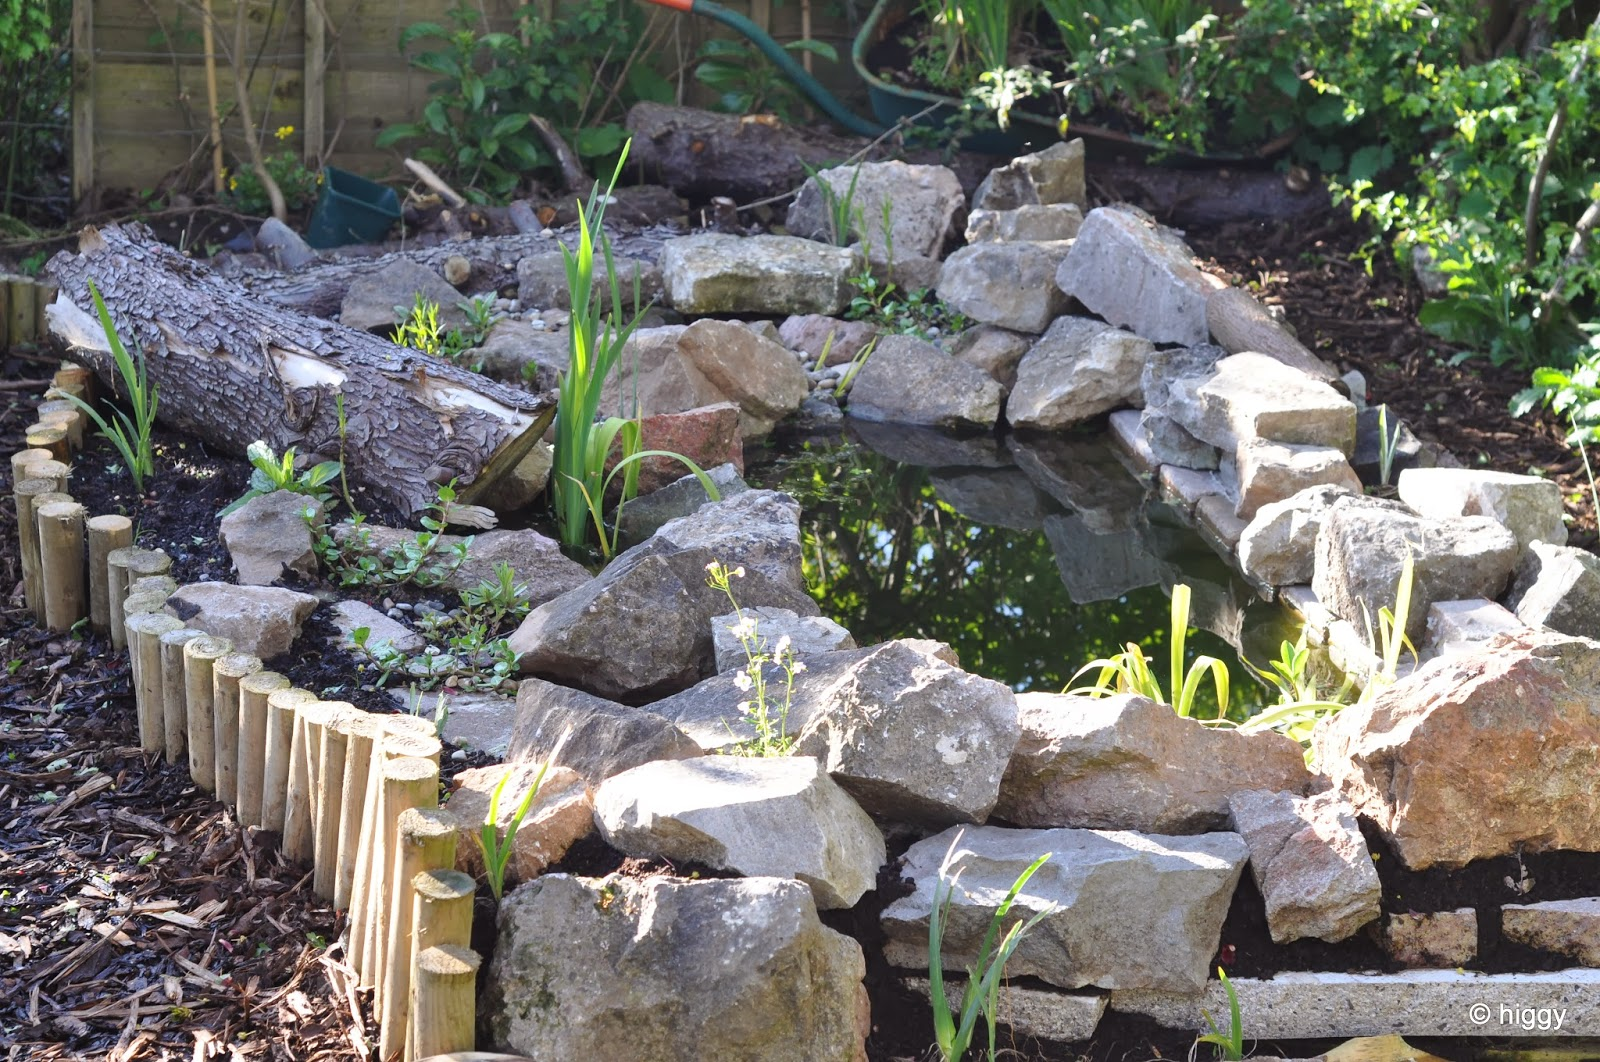 Higgy 39 s garden project as seen on bbc springwatch preparing garden ponds for winter and - Build pond wildlife haven ...